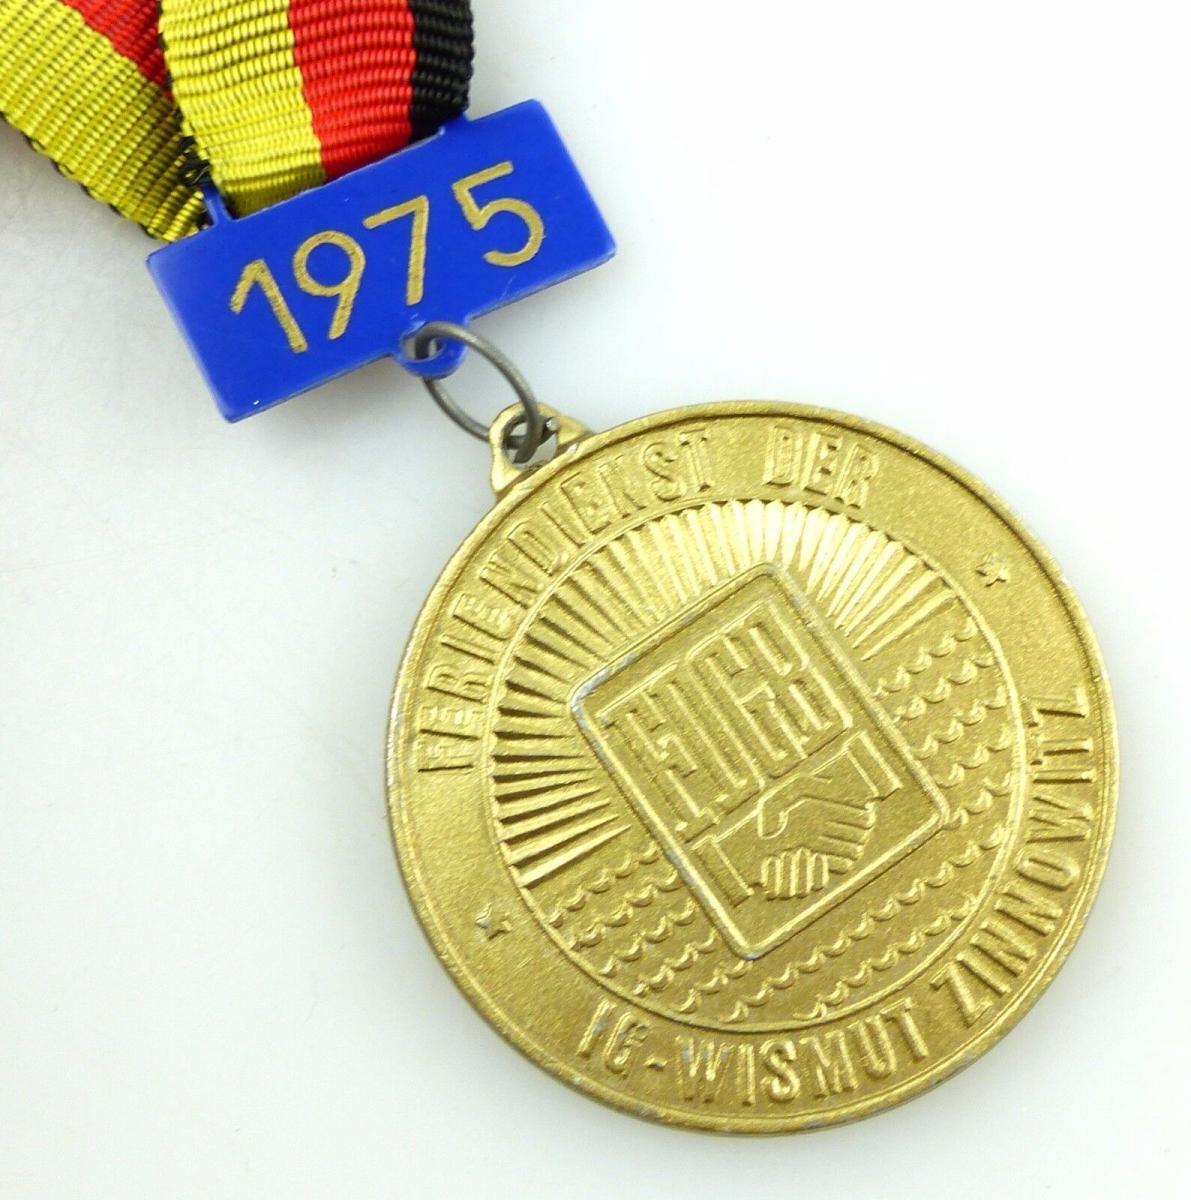 #e5795 DDR Medaille IG - Wismut - Zinnowitz FDGB Feriendienst 1975